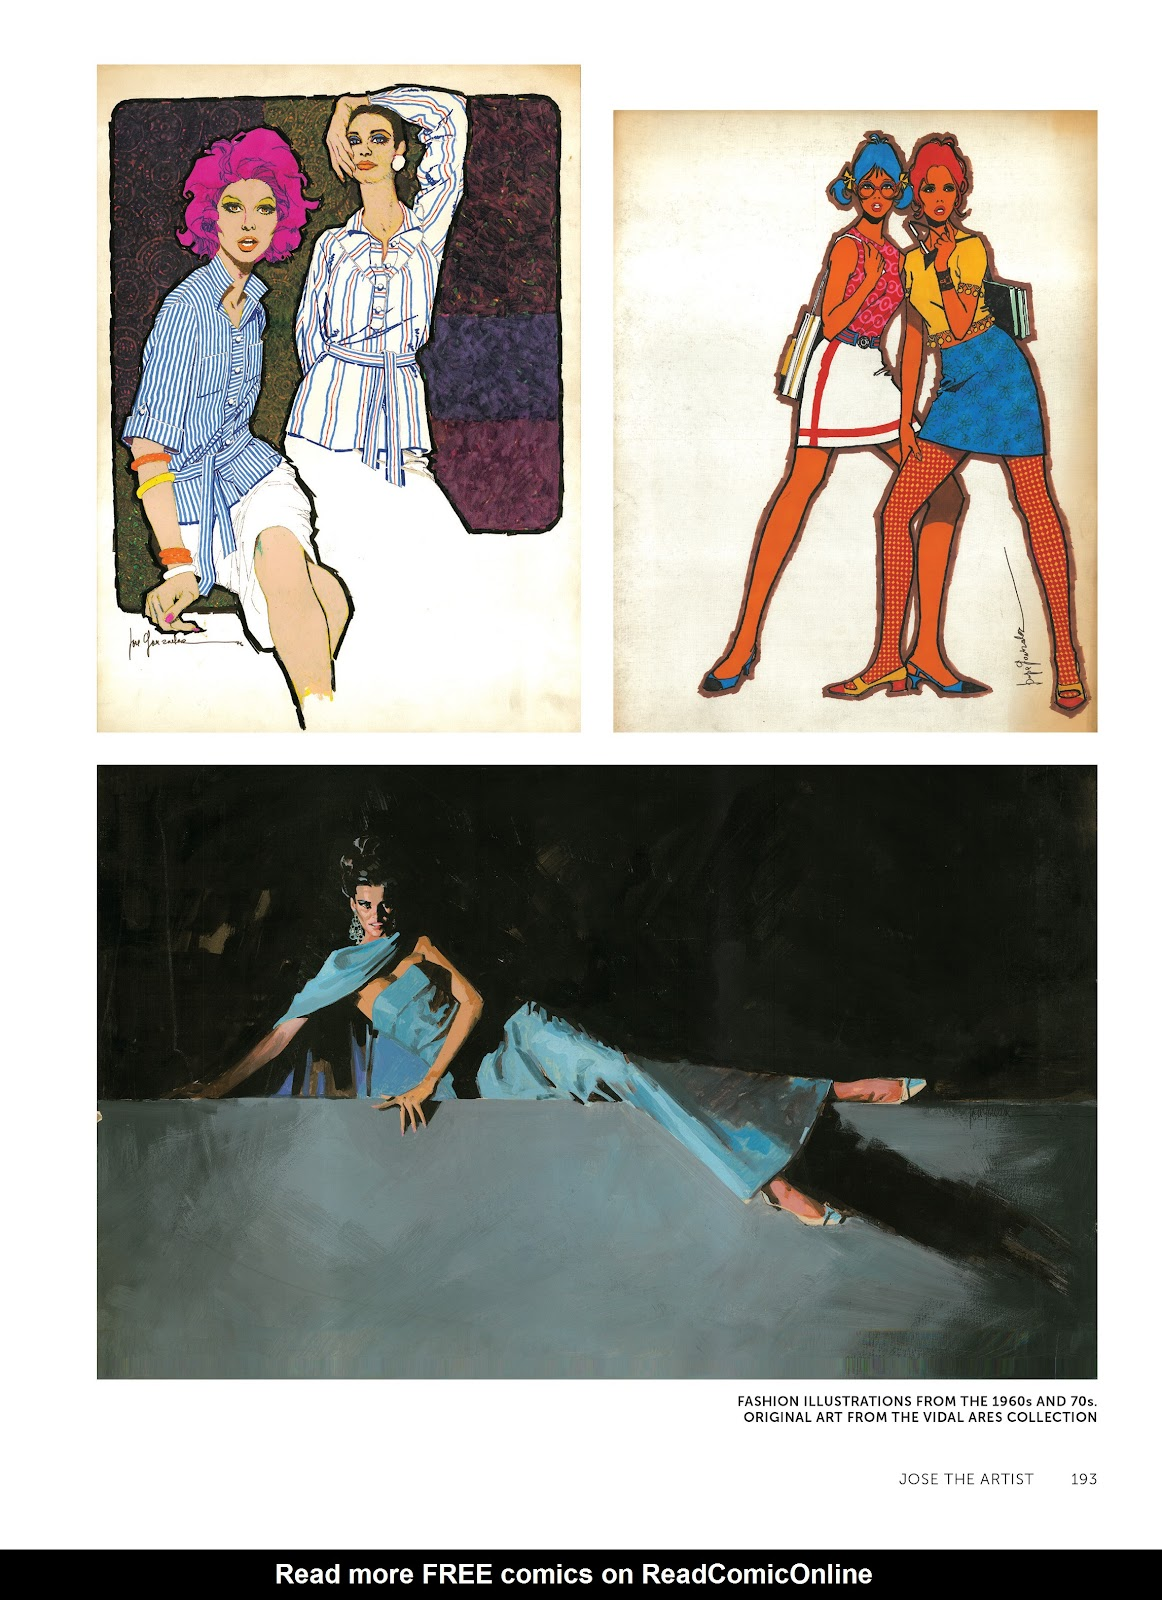 Read online The Art of Jose Gonzalez comic -  Issue # TPB (Part 2) - 95